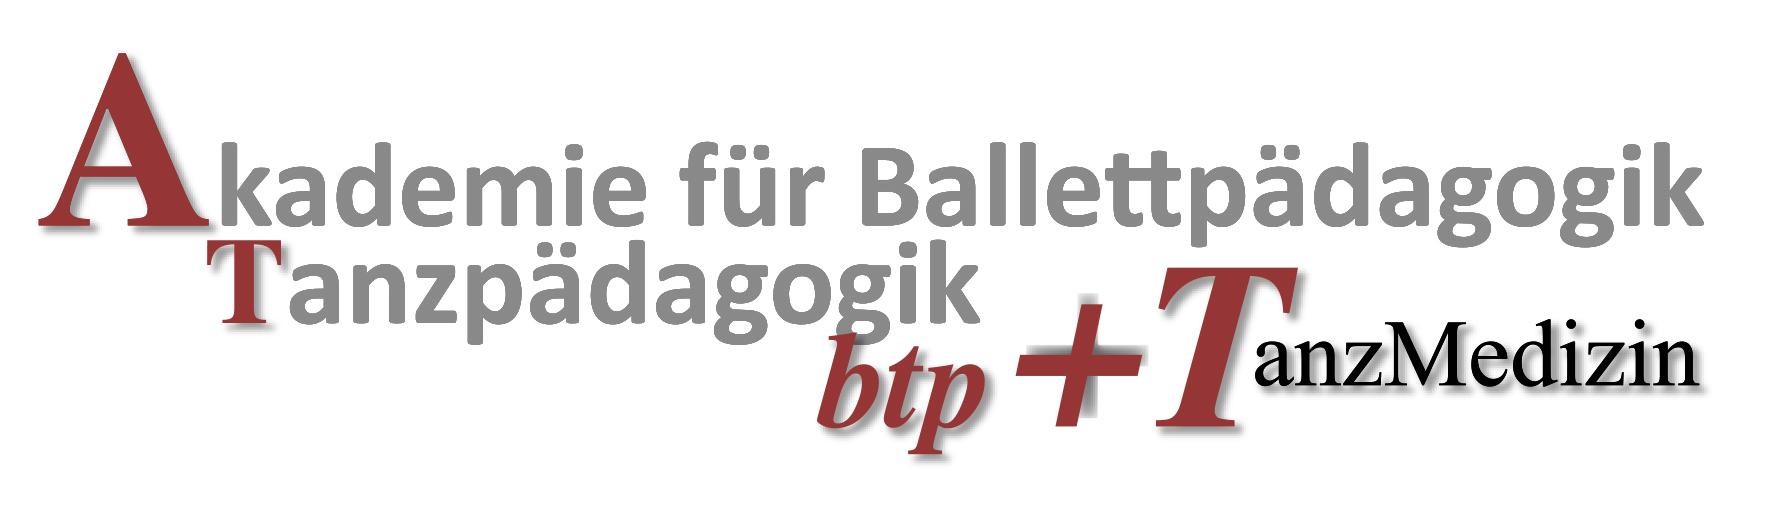 Tanzpädagogik - Diplom Tanzpädagogik